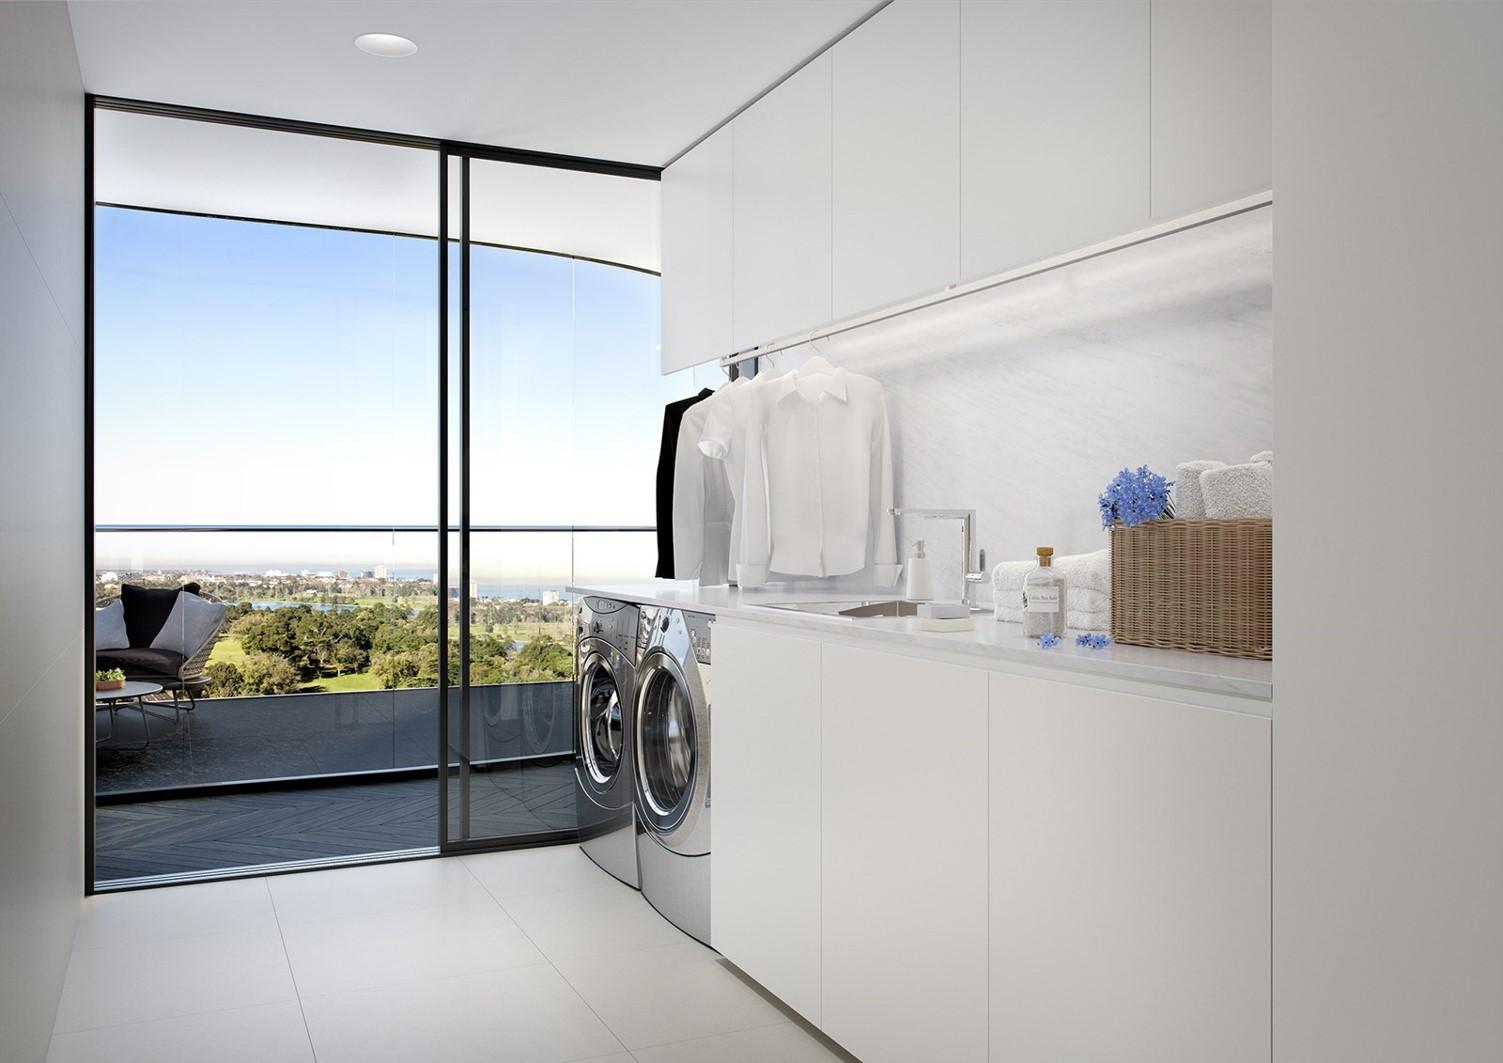 Laundry pic1.jpg